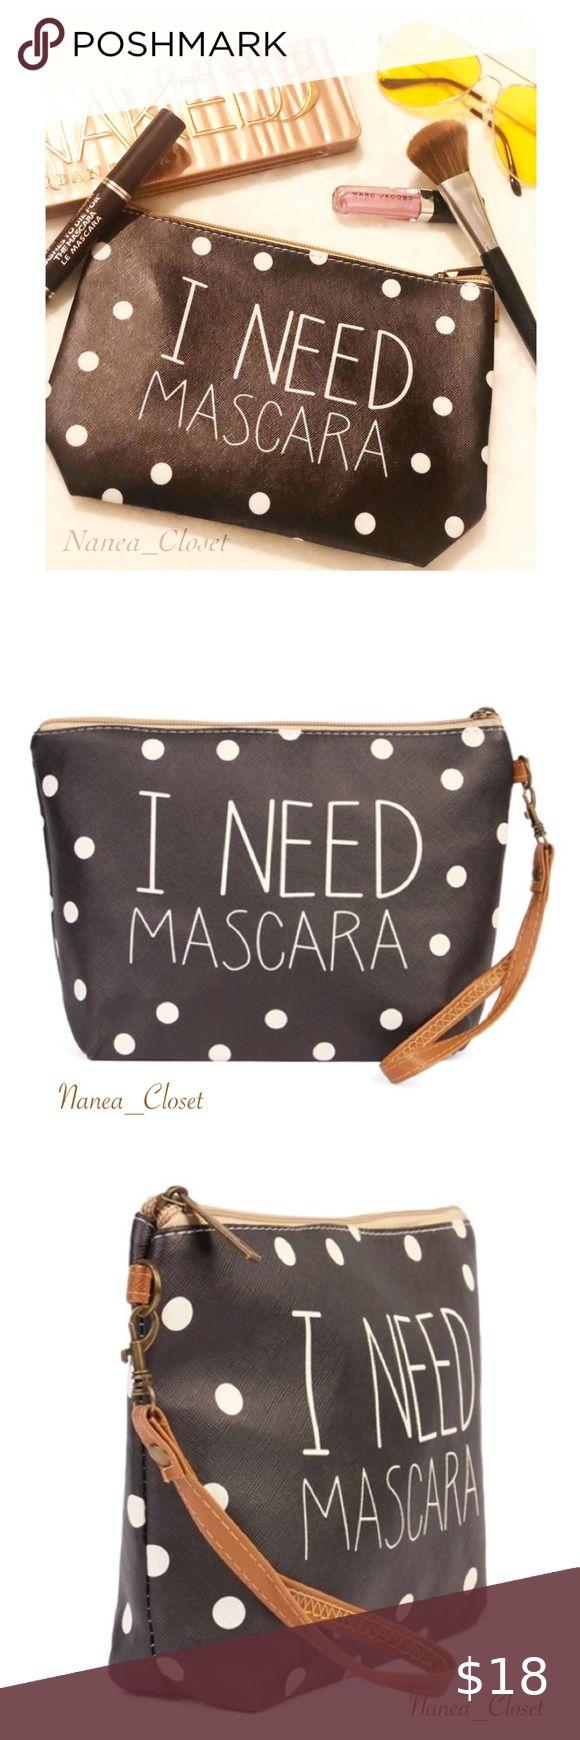 "Cosmetic Bag ""I Need Mascara"" Polka Dot in 2020 Bags"